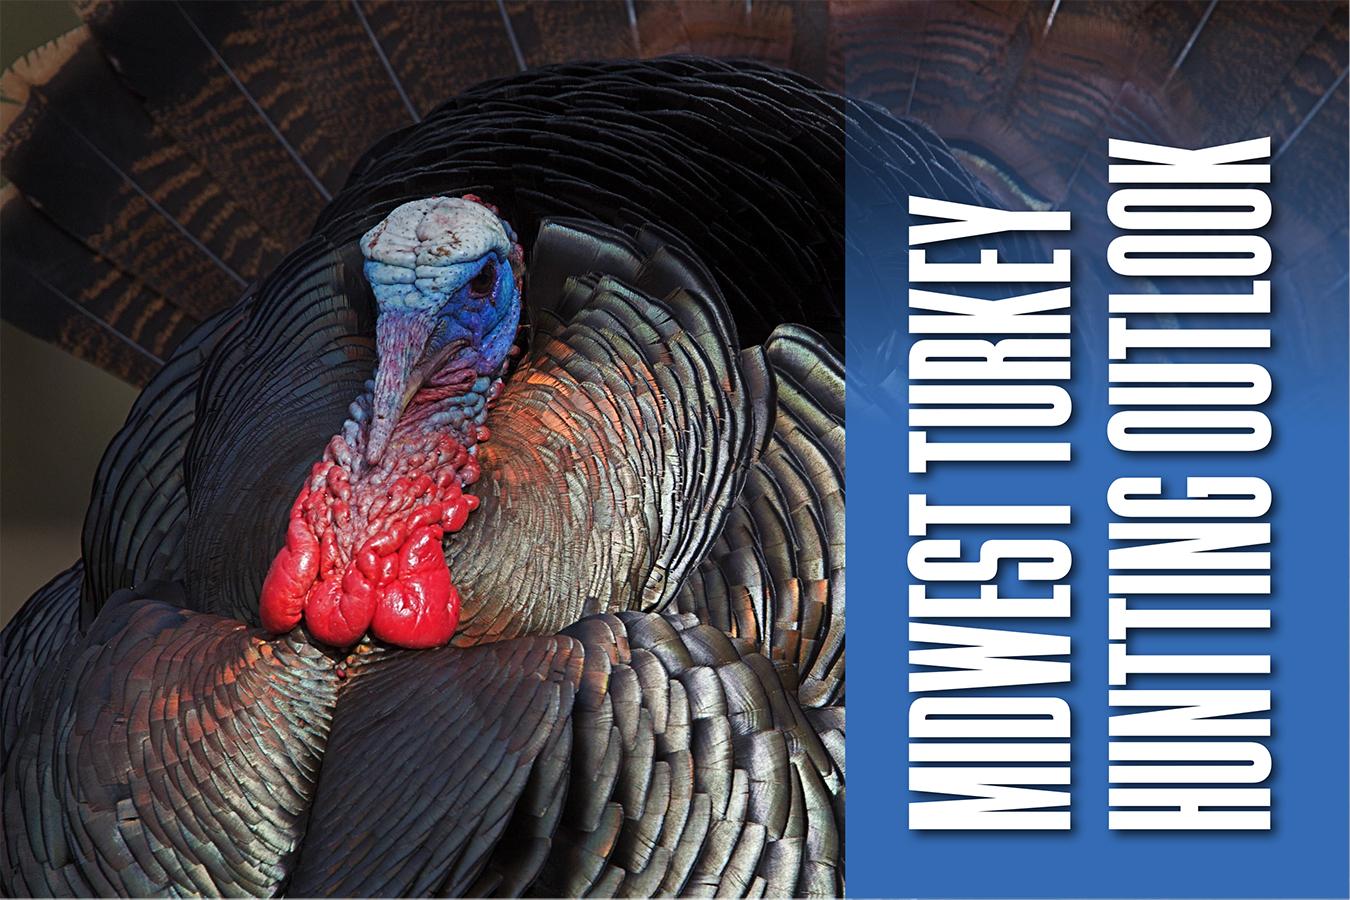 2018 Midwestern Turkey Hunting Outlook